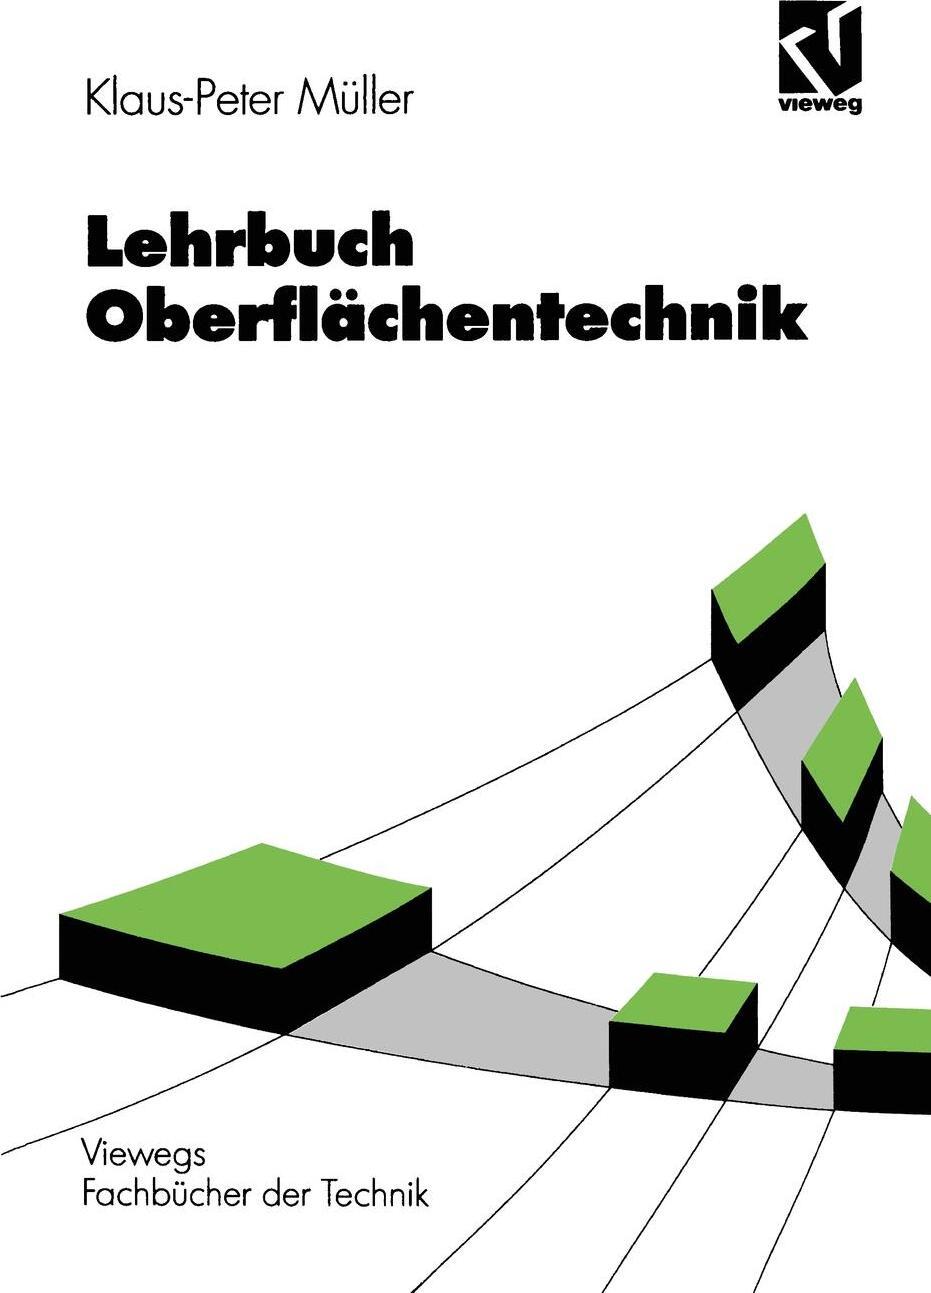 Lehrbuch Oberflachentechnik